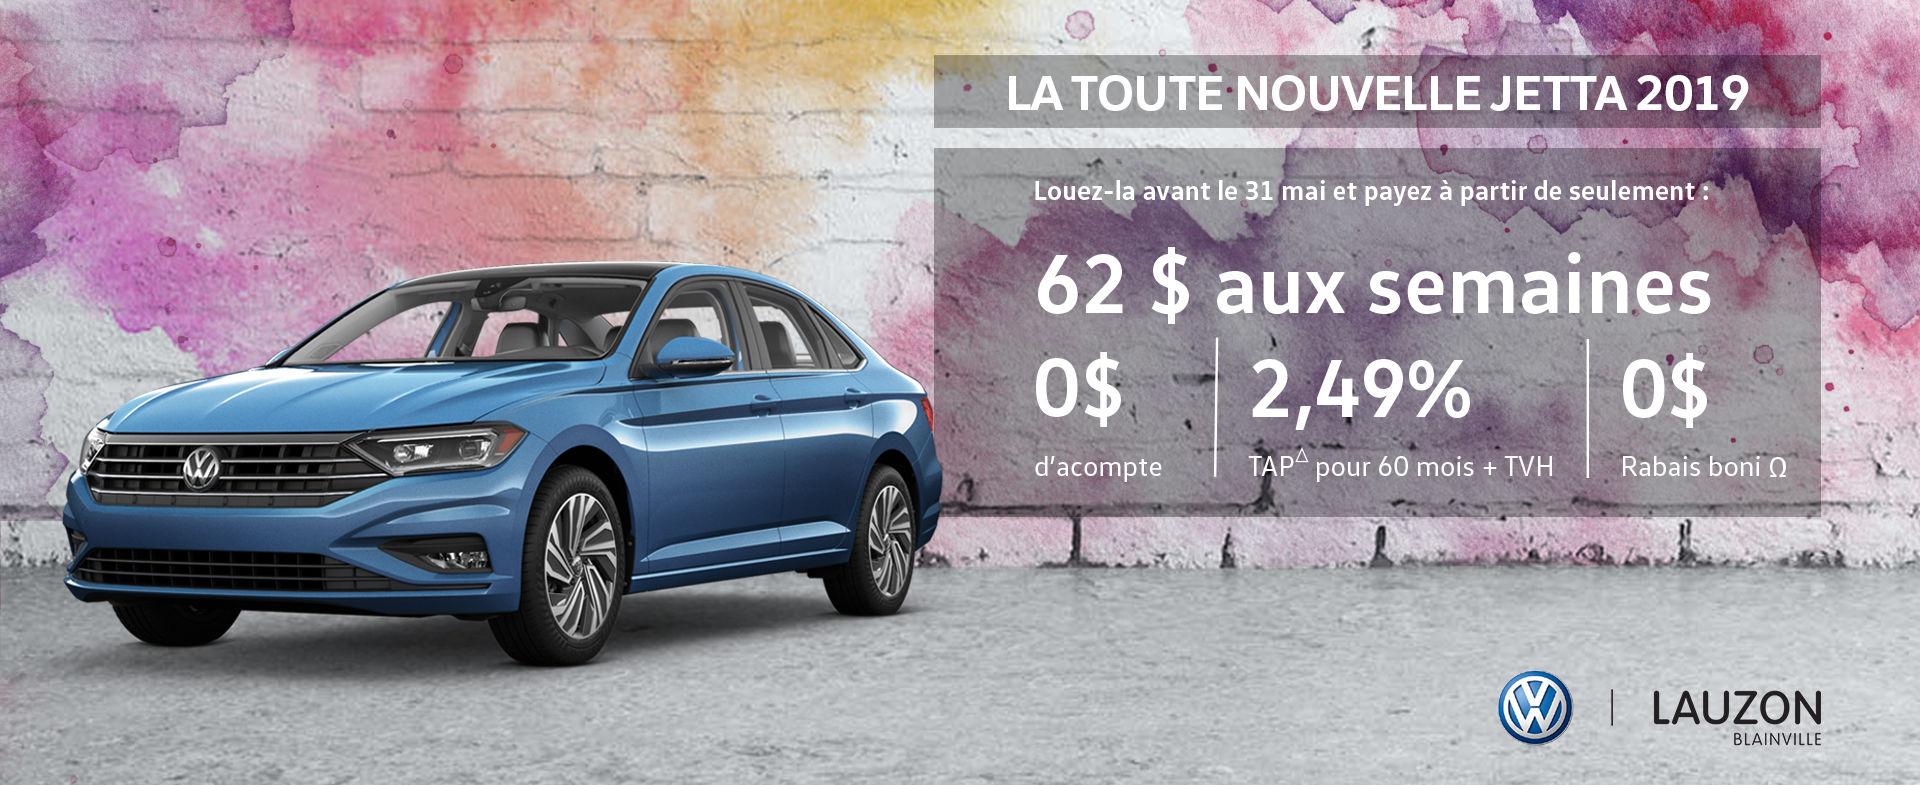 Promotion mai 2018 Volkswagen Jetta 2019 VW Lauzon Blainville